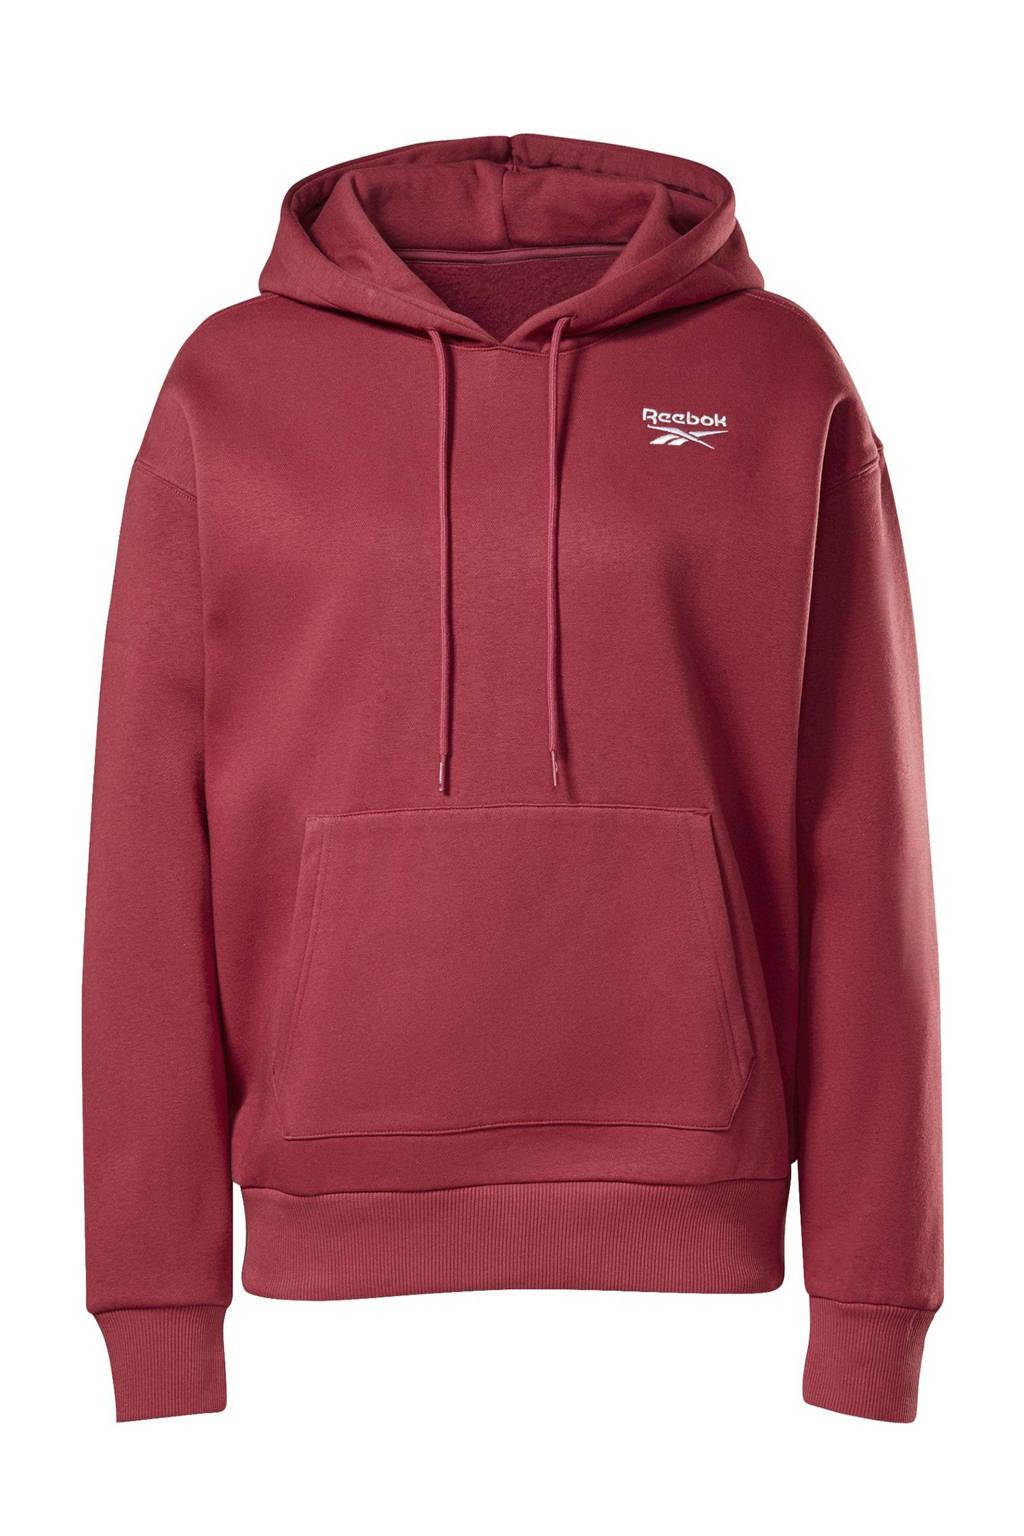 Reebok Classics fleece hoodie fuchsia, Fuchsia